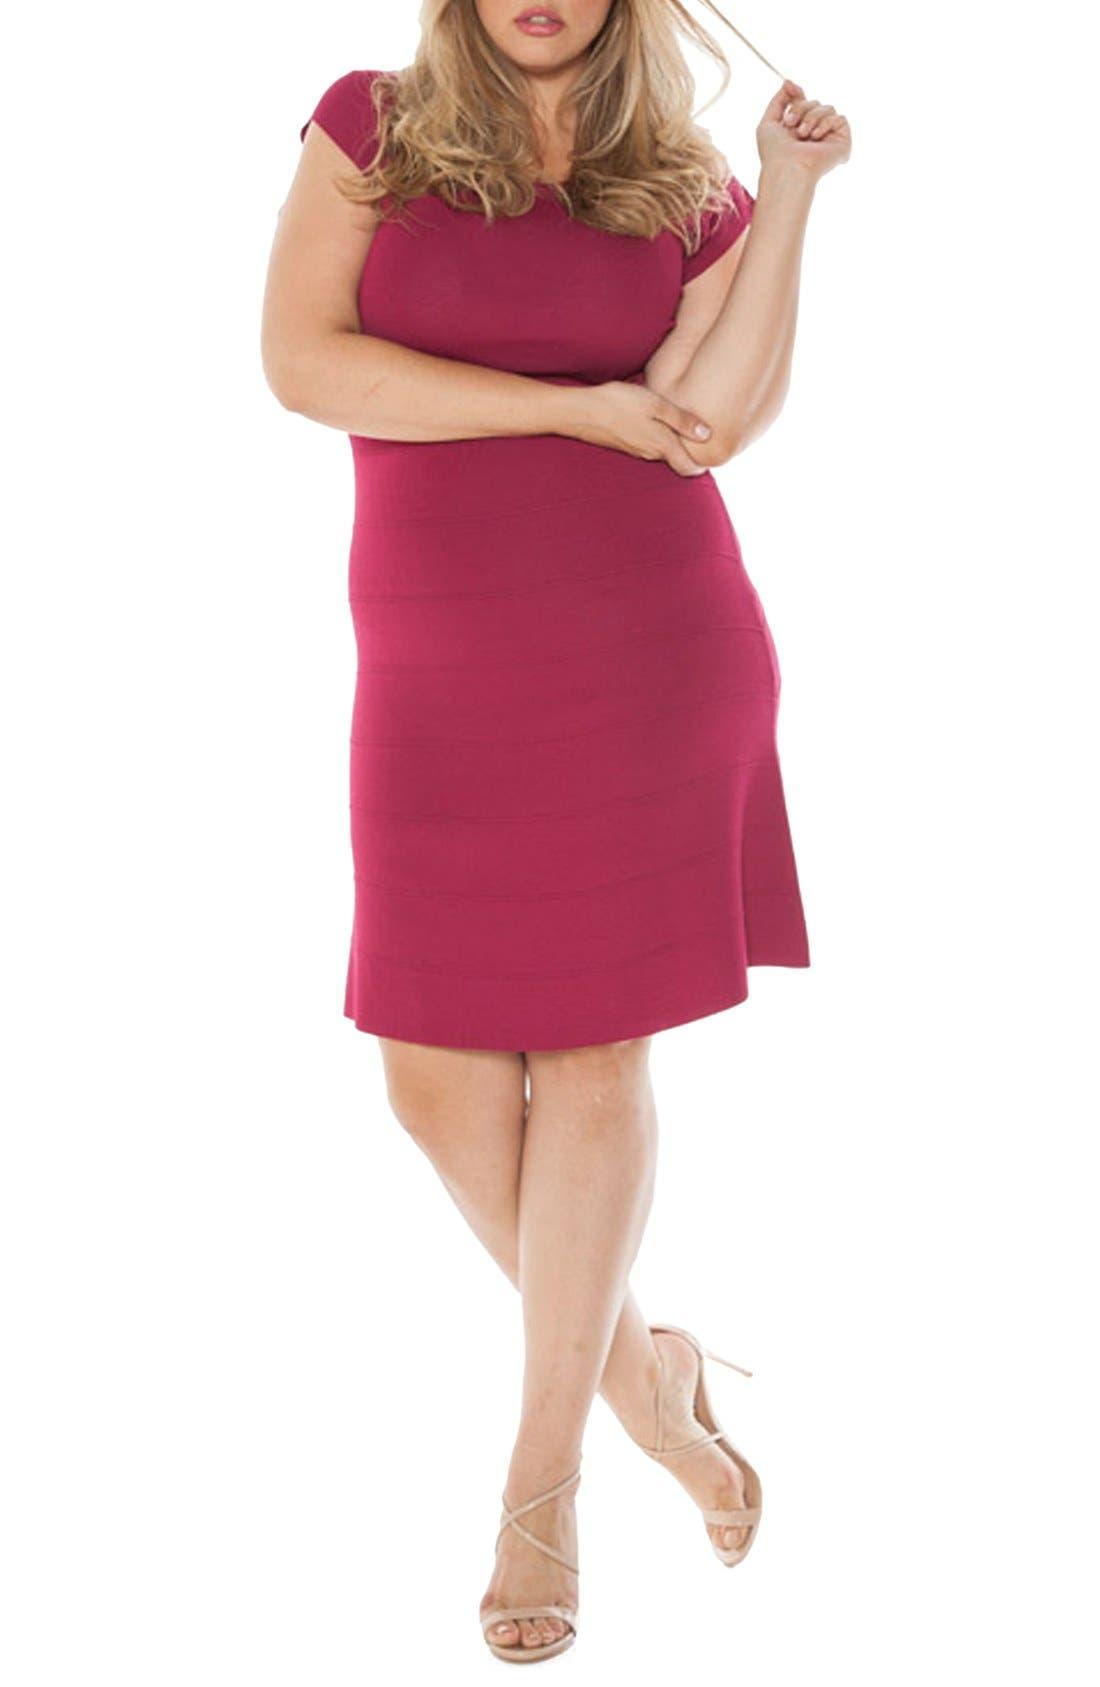 Main Image - SLINK Jeans Cap Sleeve Knit A-Line Dress (Plus Size)